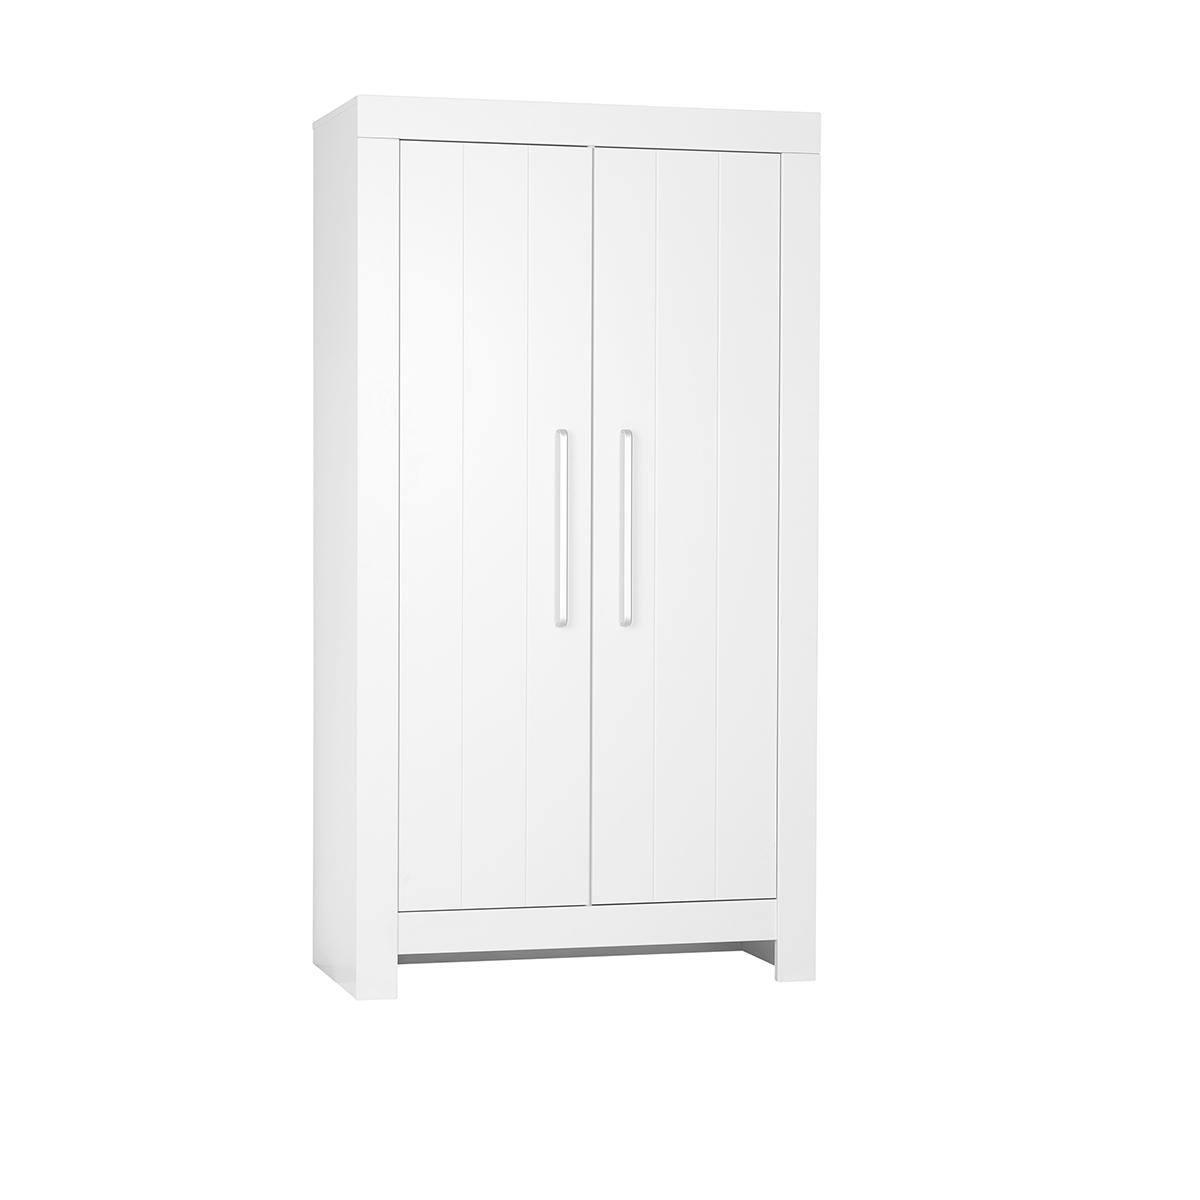 Pinio - Armoire 2 portes Calmo - Blanc